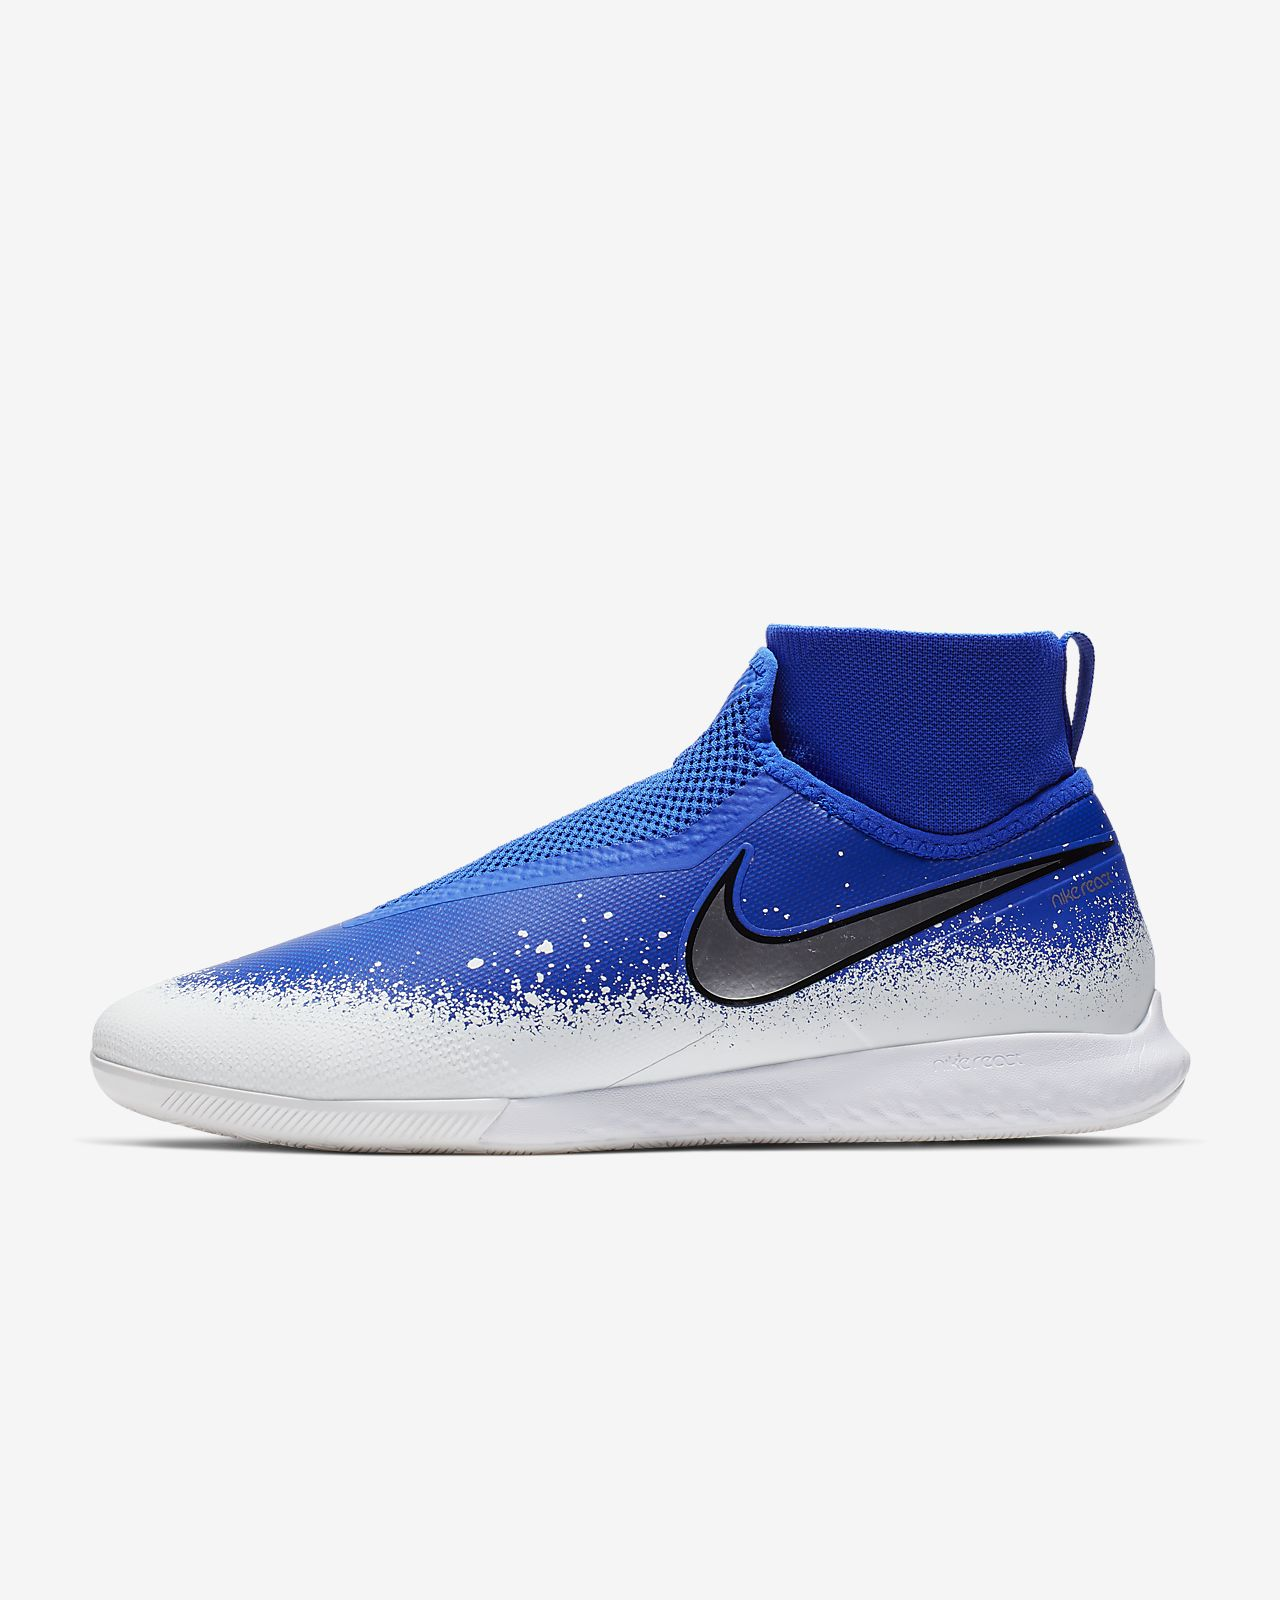 Fotbollssko för inomhusplan/futsal/street Nike React Phantom Vision Pro Dynamic Fit IC